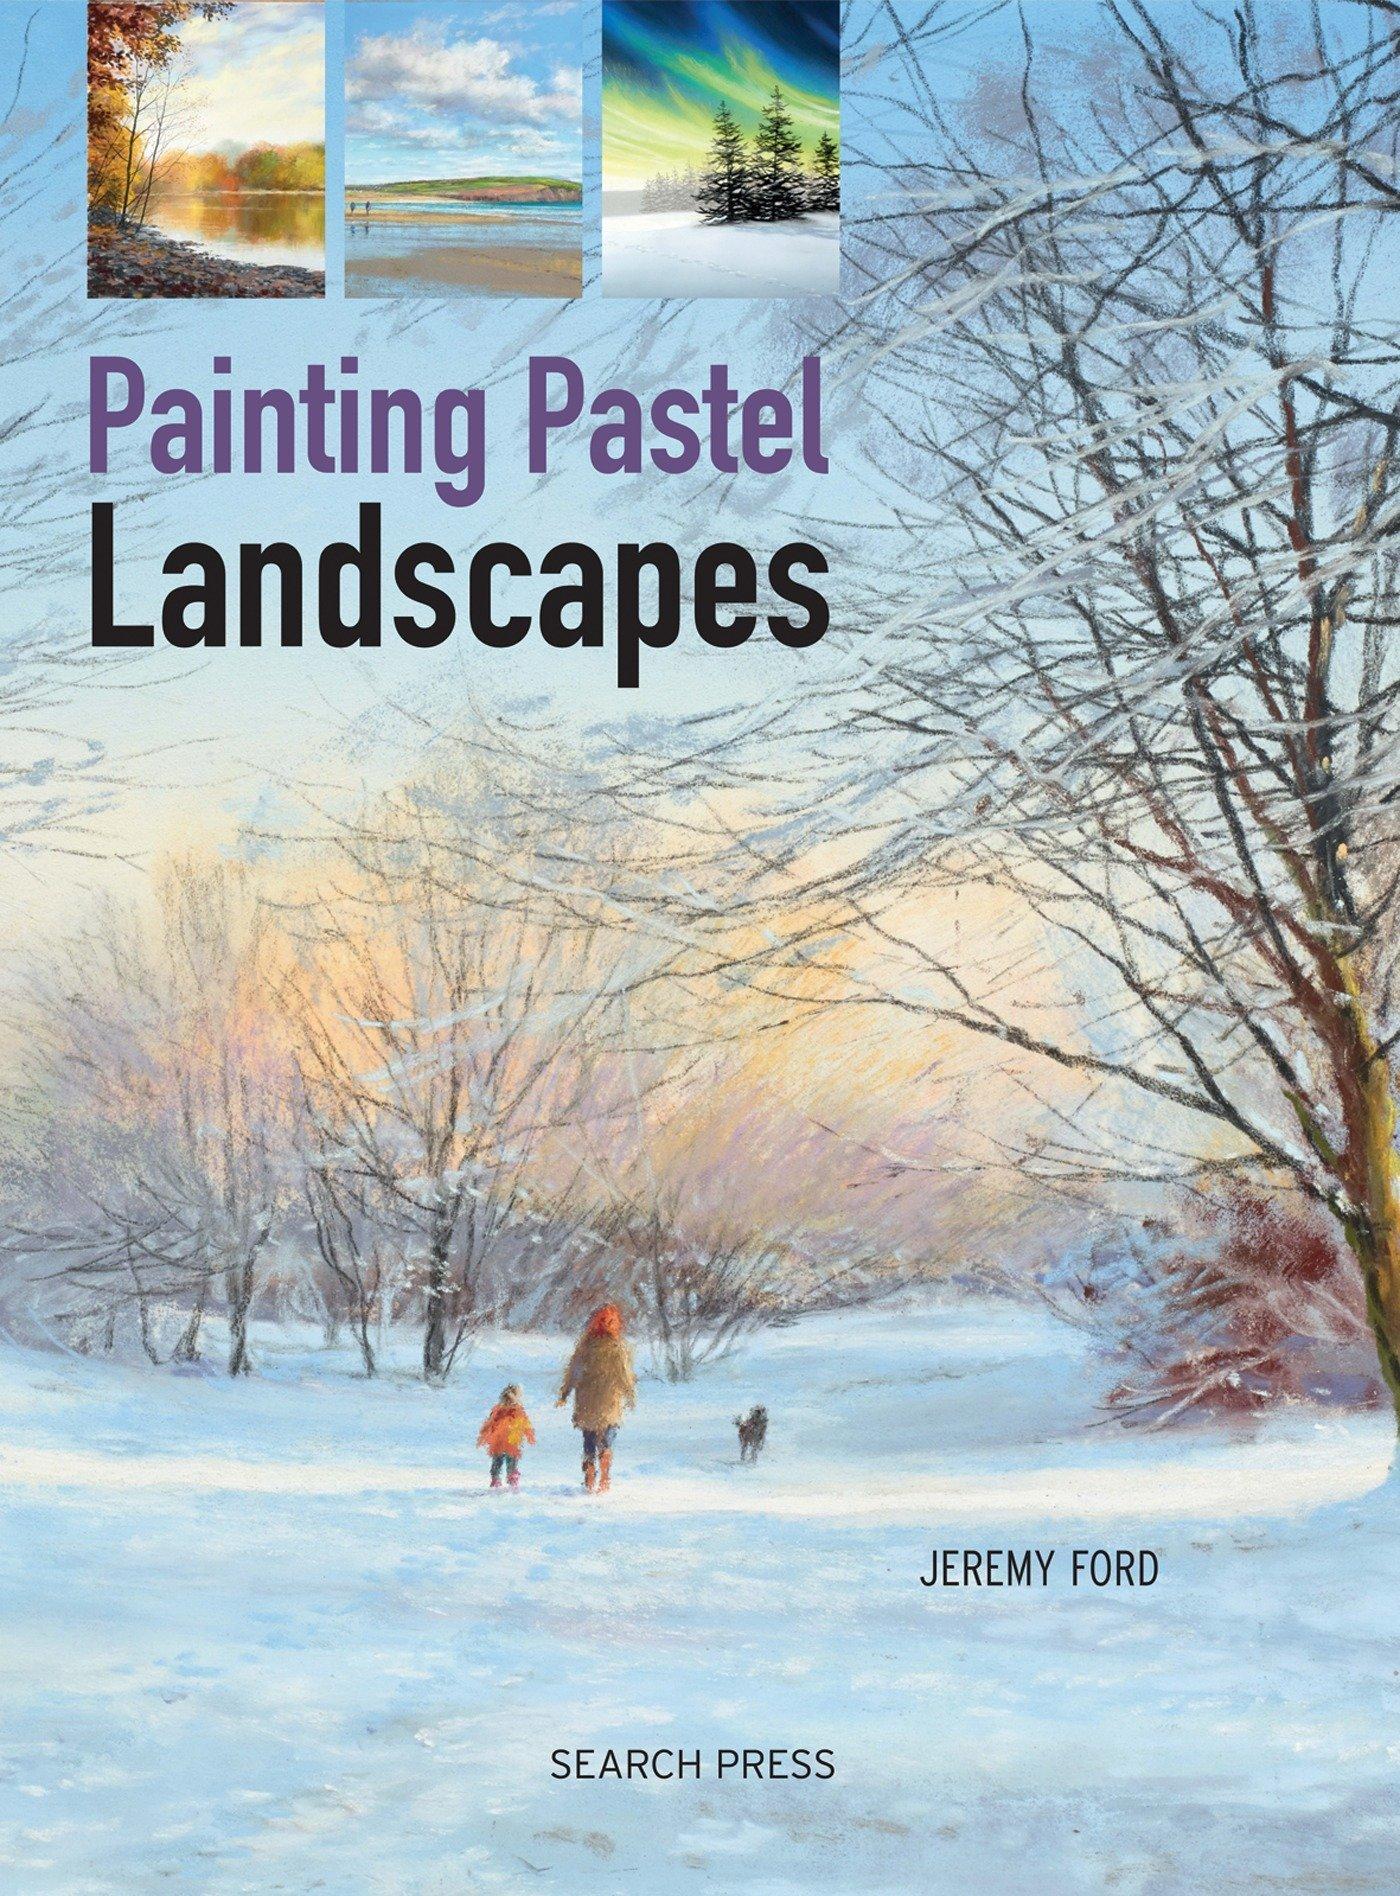 Painting Pastel Landscapes: Jeremy Ford: 9781782211167: Amazon.com: Books